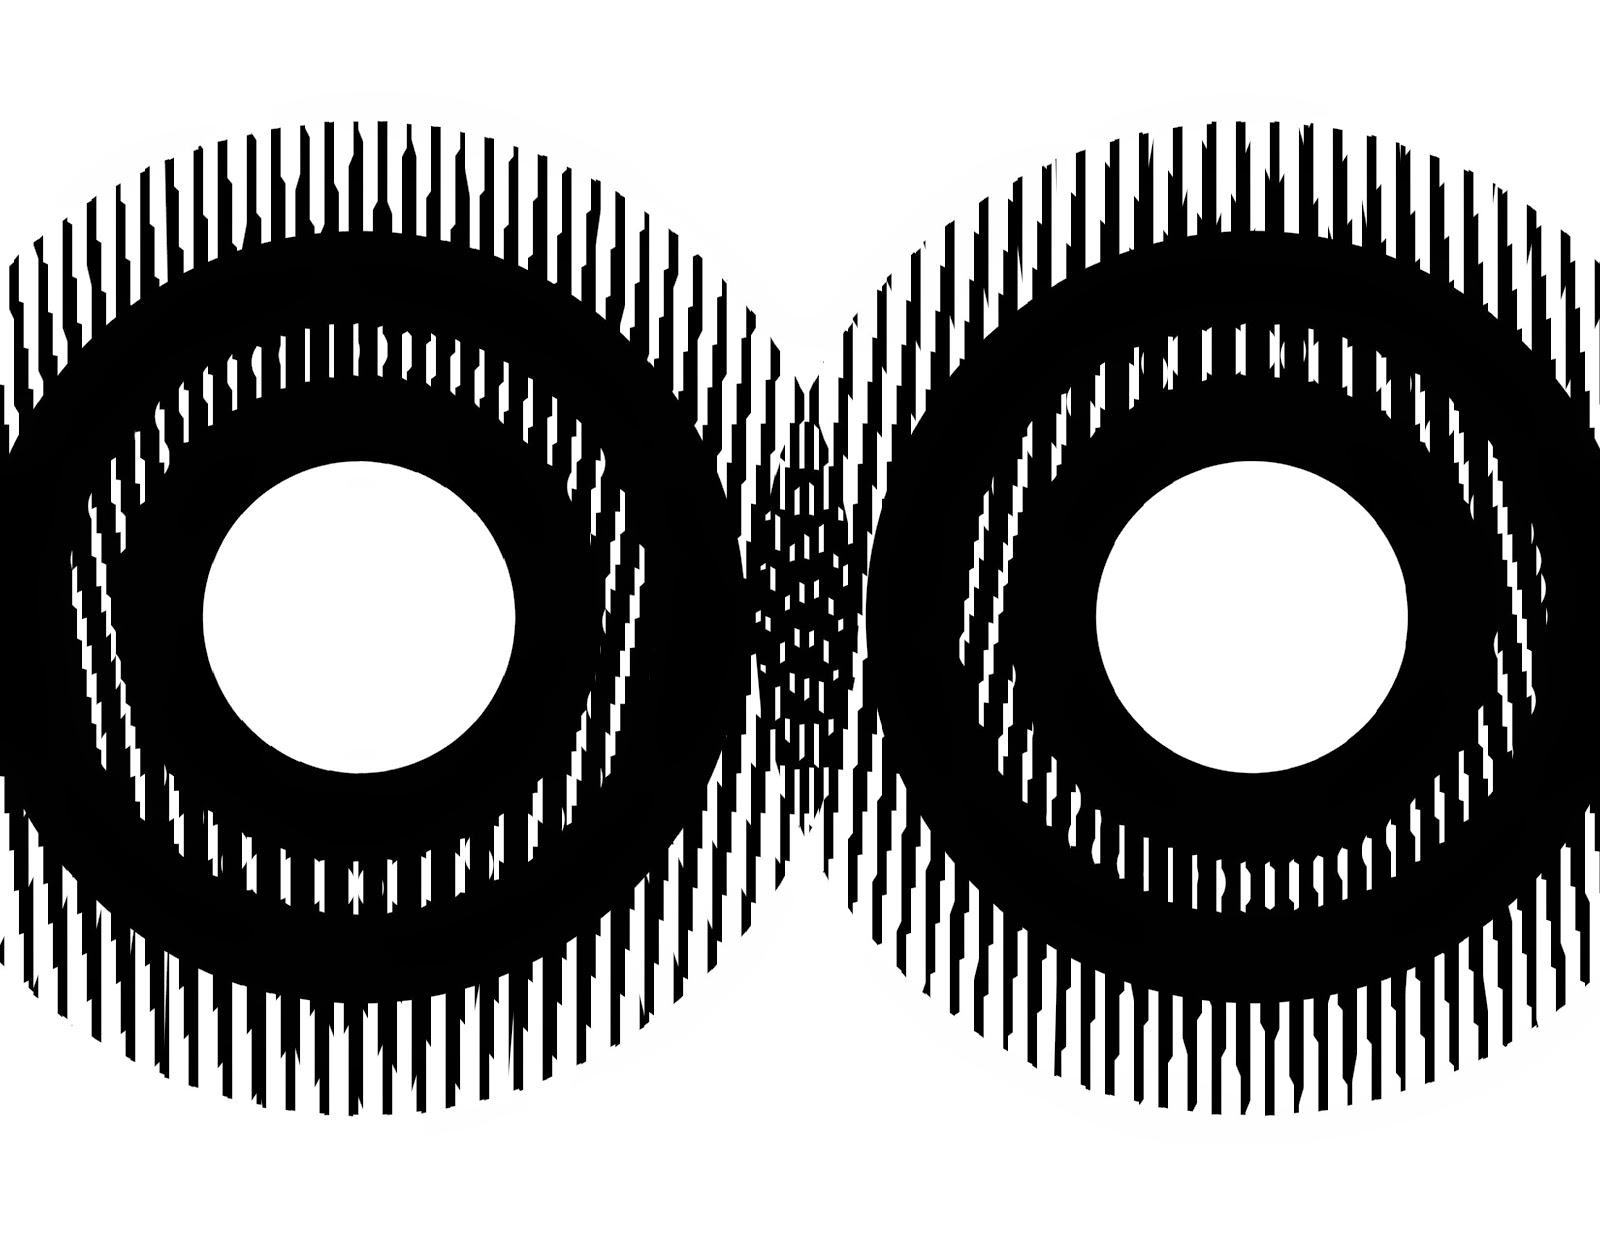 Ilusi Optik Hasilkan Gambar Animasi Hujungjari